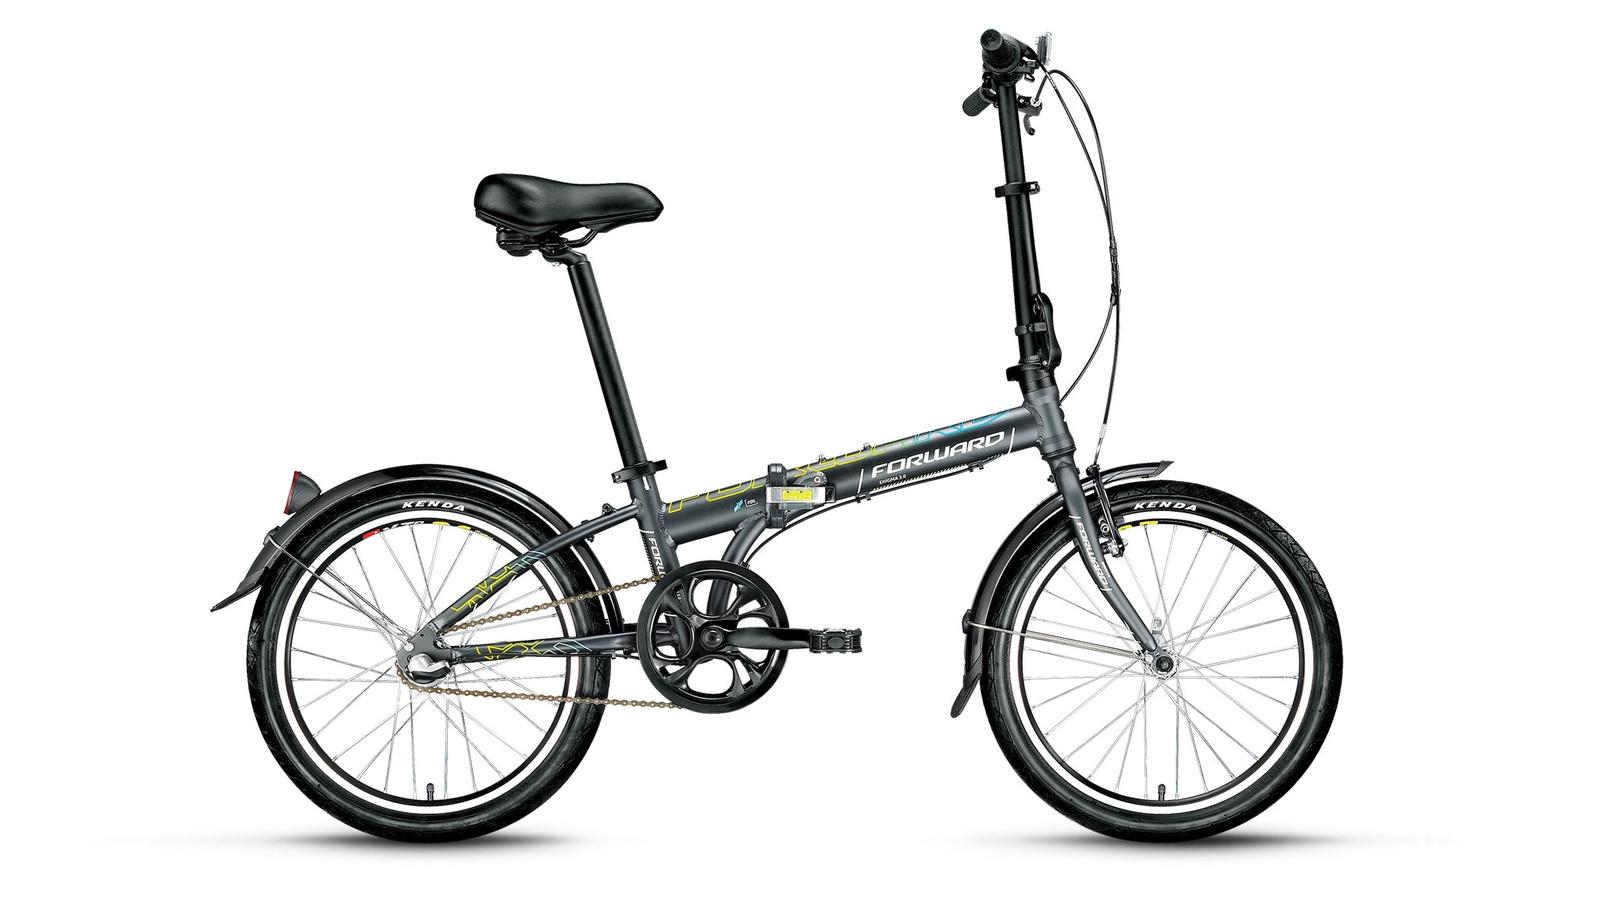 Велосипед Forward Enigma 20 3.0 2019, темно-серый